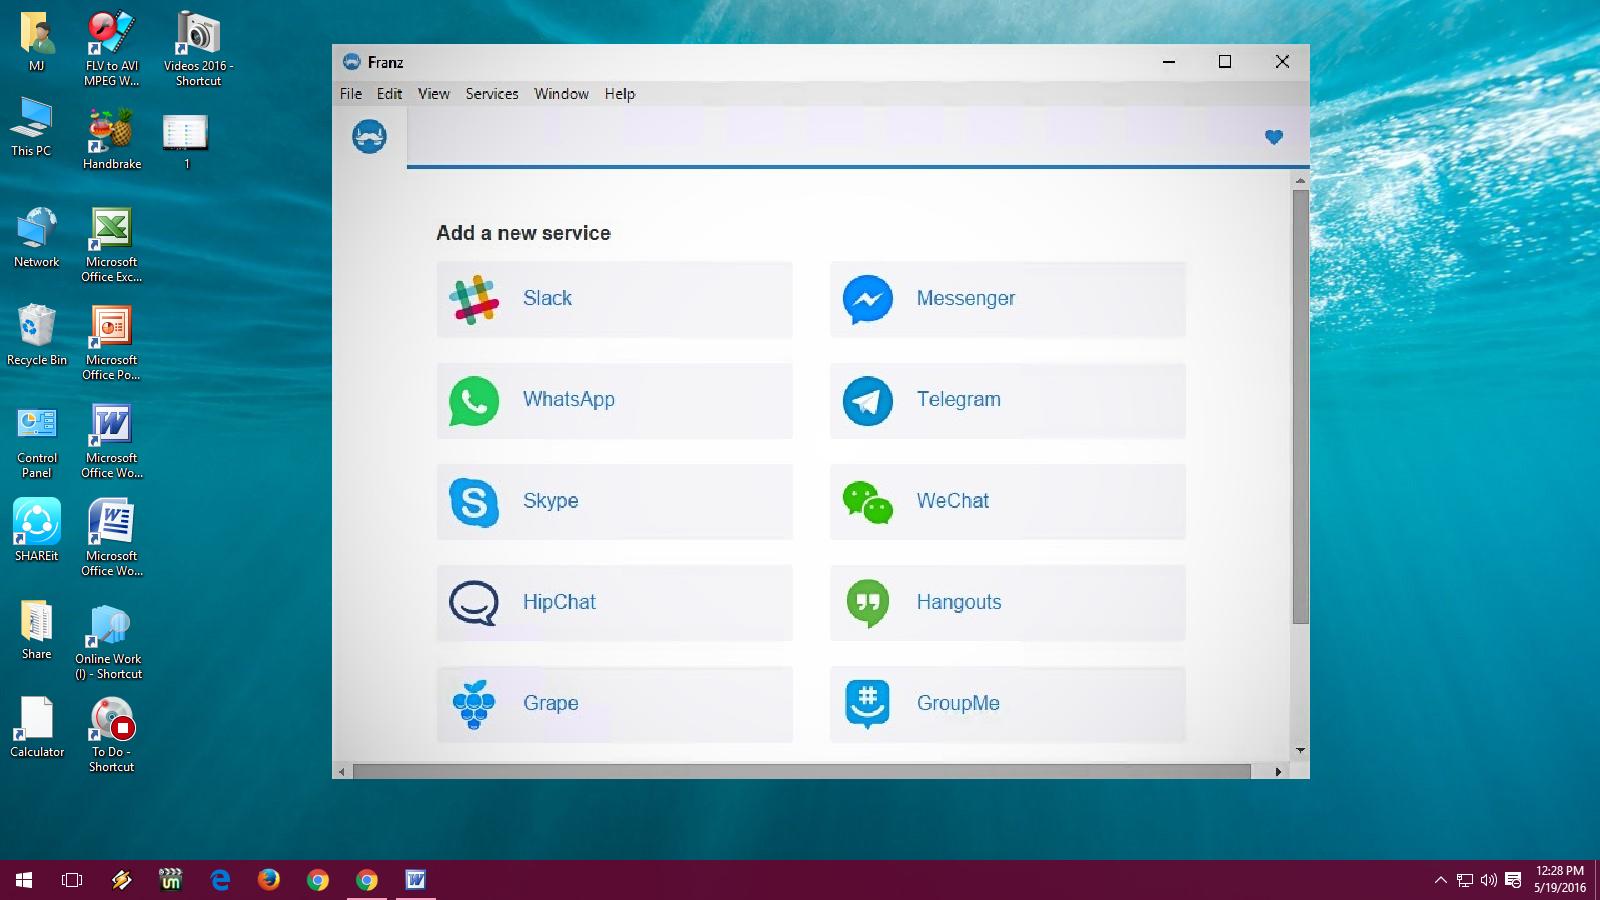 Learn New Things: One Messenger App for WhatsApp, Skype, FB